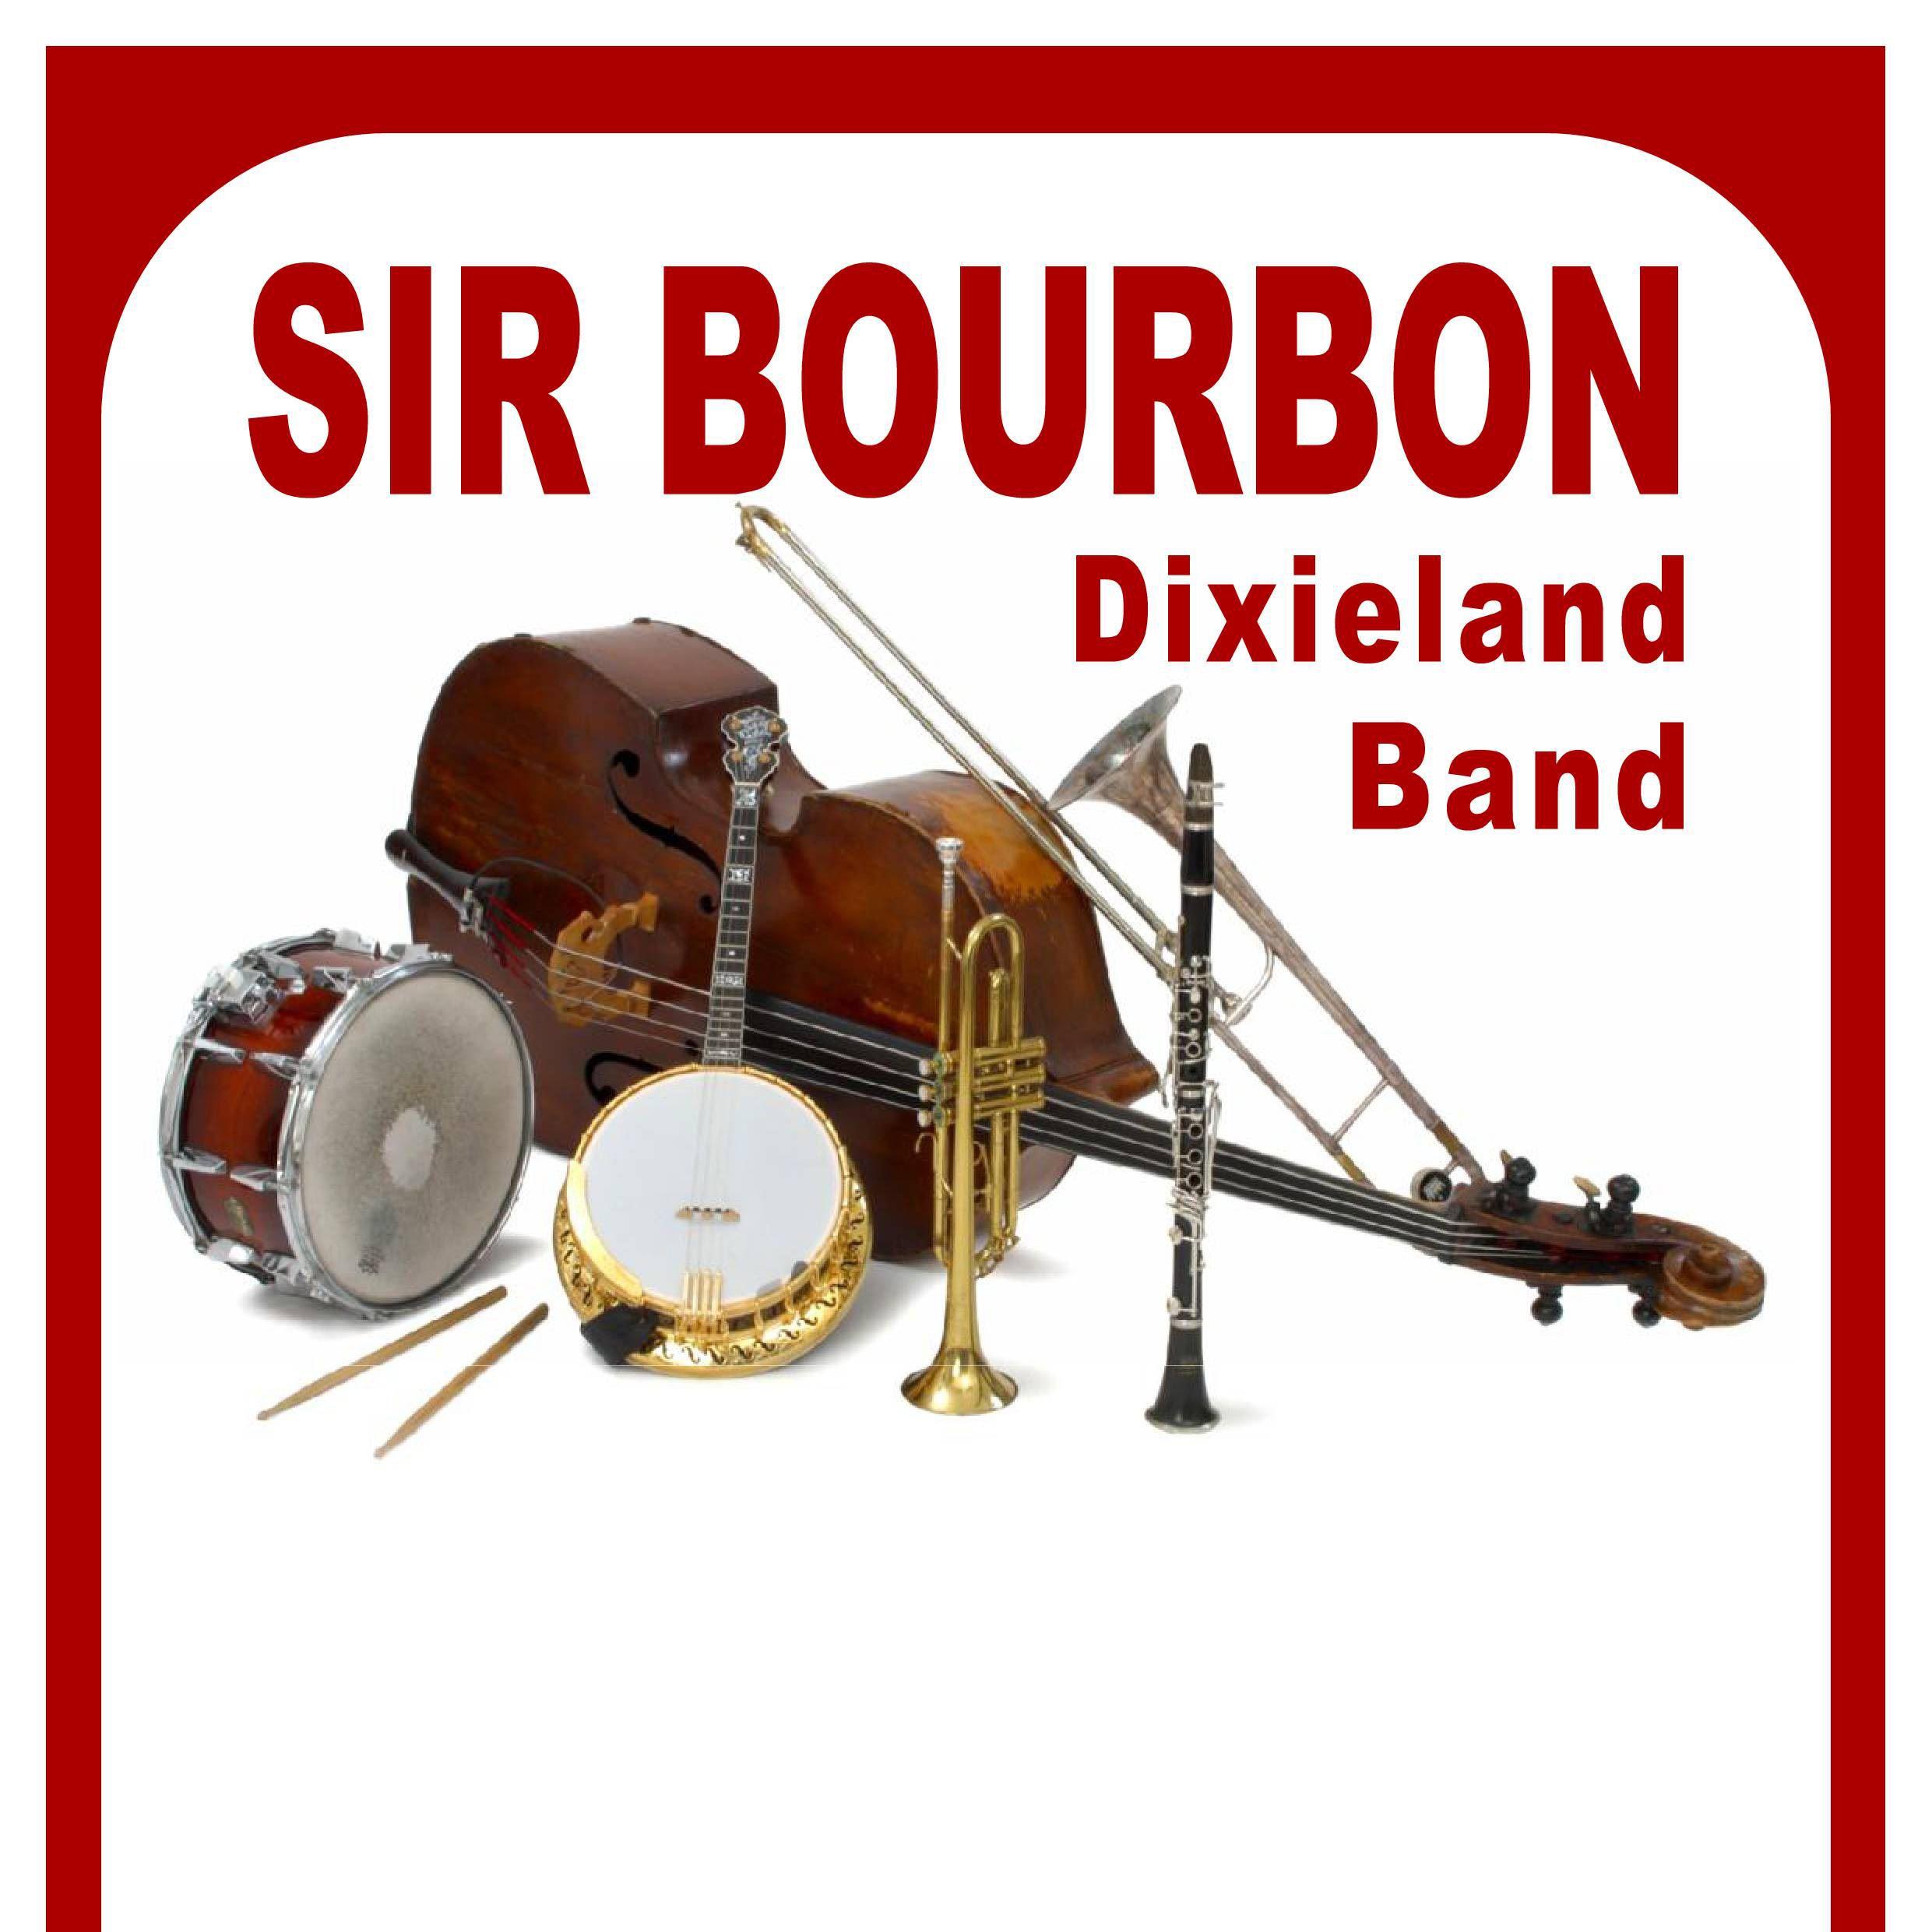 Sirbourbon Dixieland Band